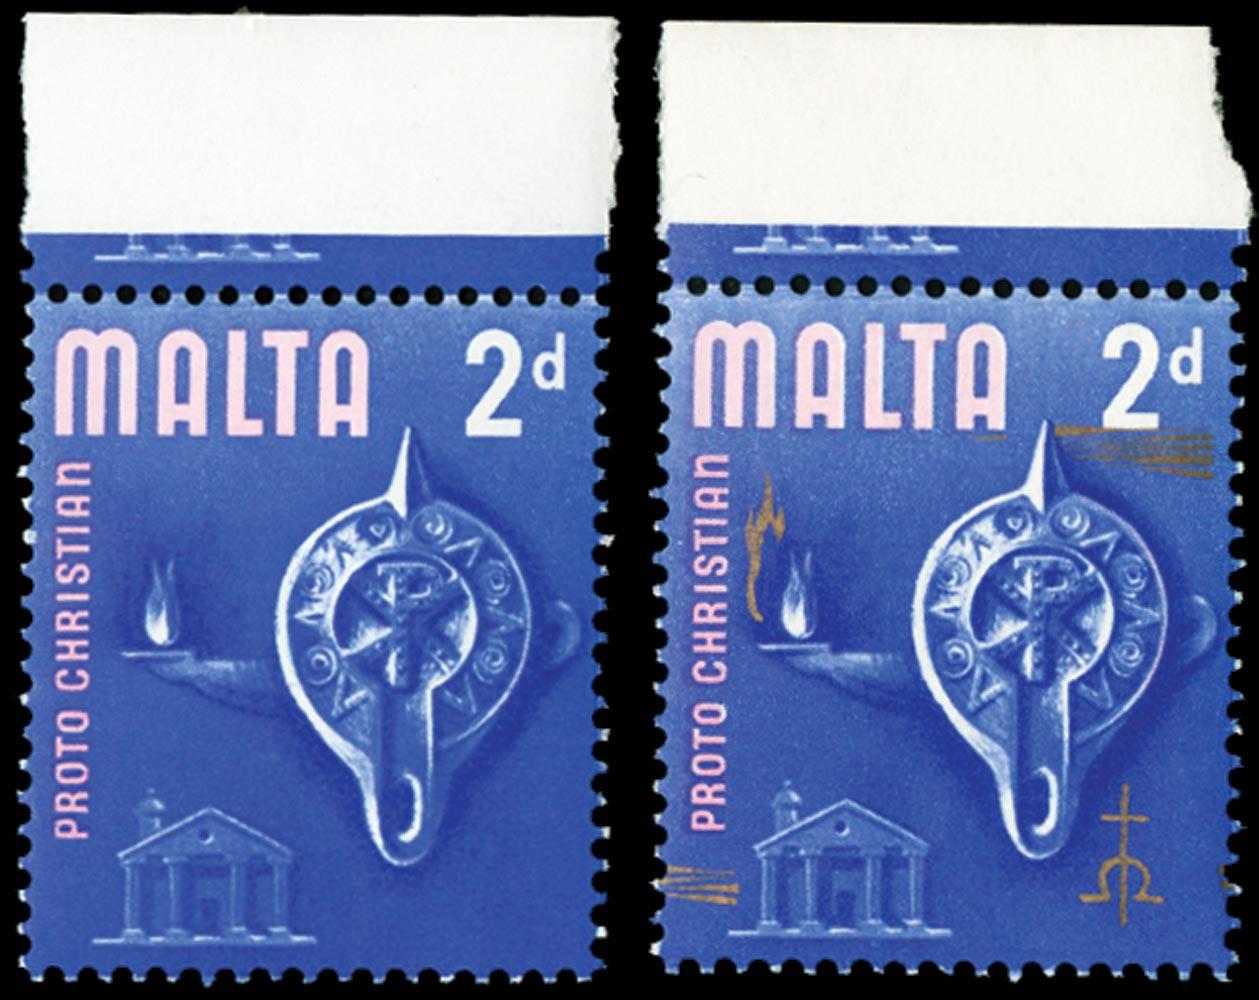 MALTA 1965  SG333a Mint